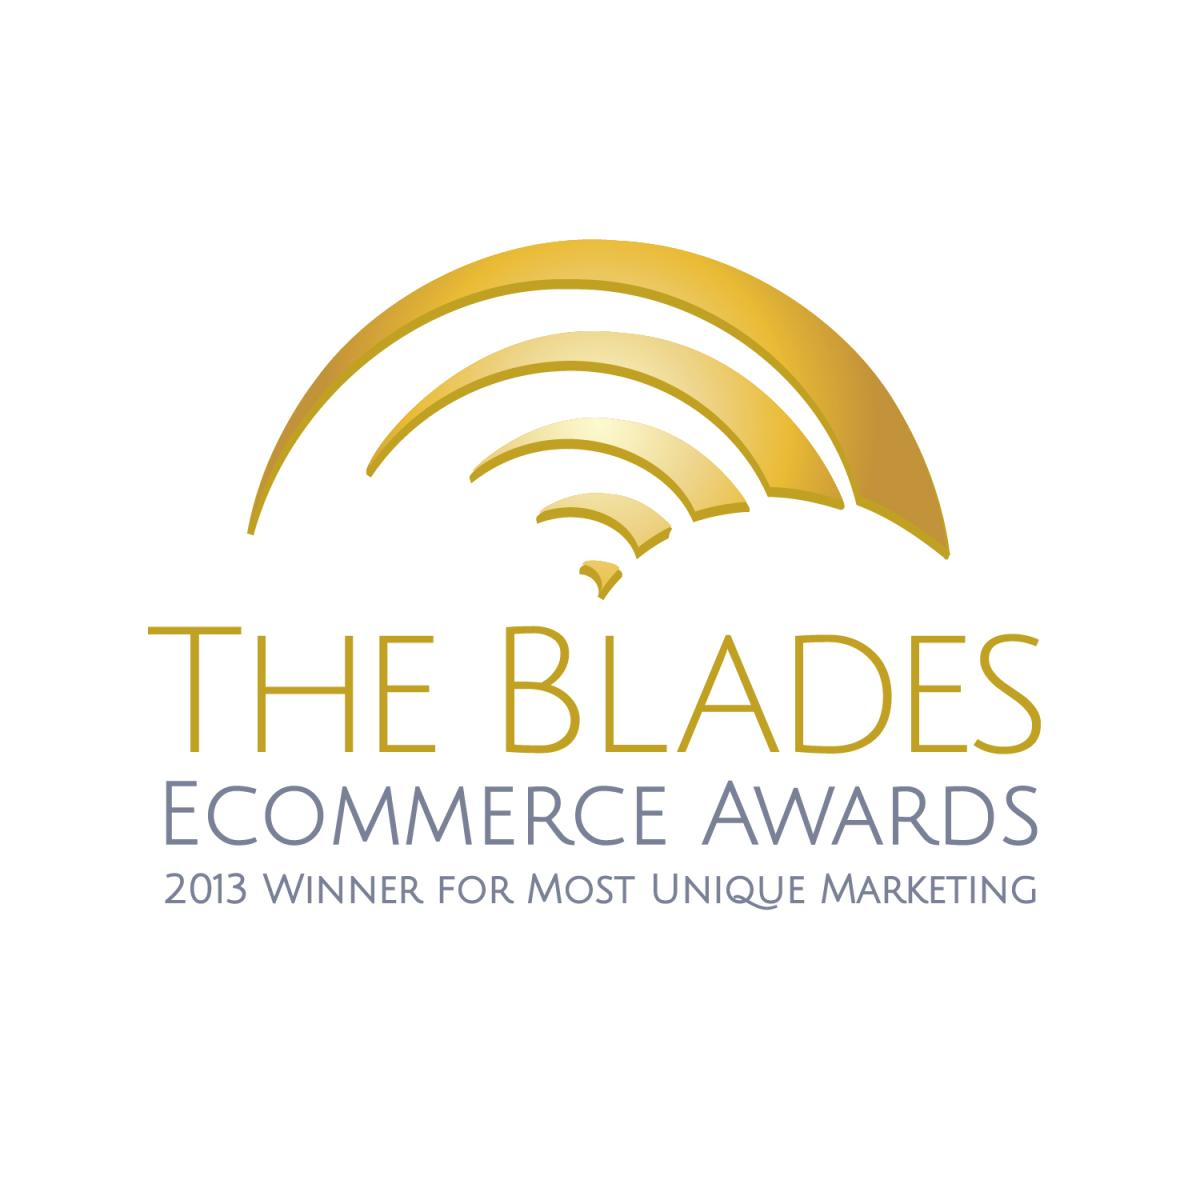 DirectFix Winner for Most Unique Marketing - Miva Blades Award 2013